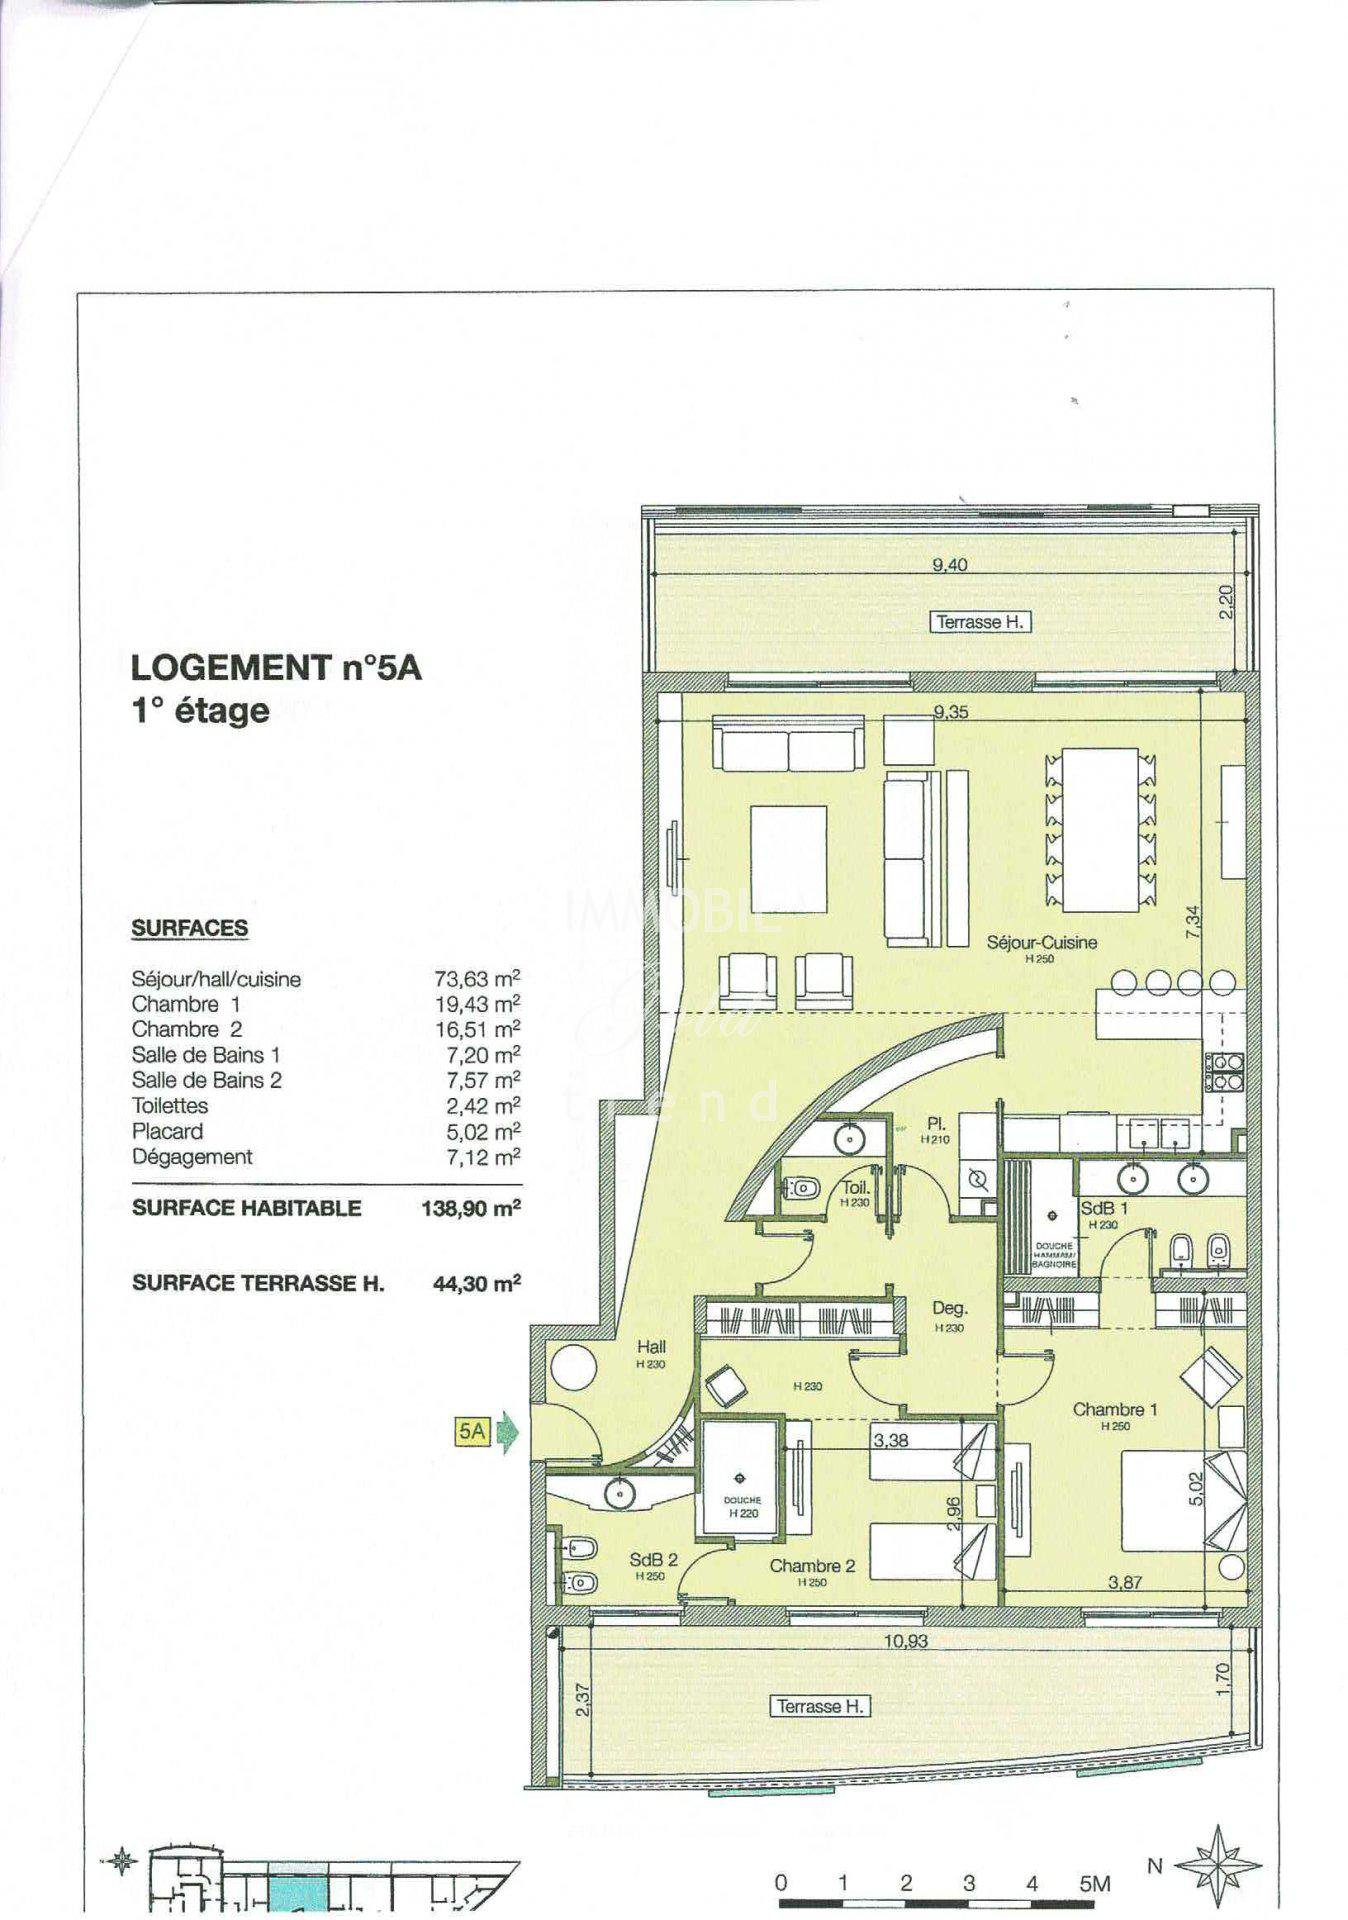 Продажа Апартаменты - Сен-Жан-Кап-Ферра (Saint-Jean-Cap-Ferrat)